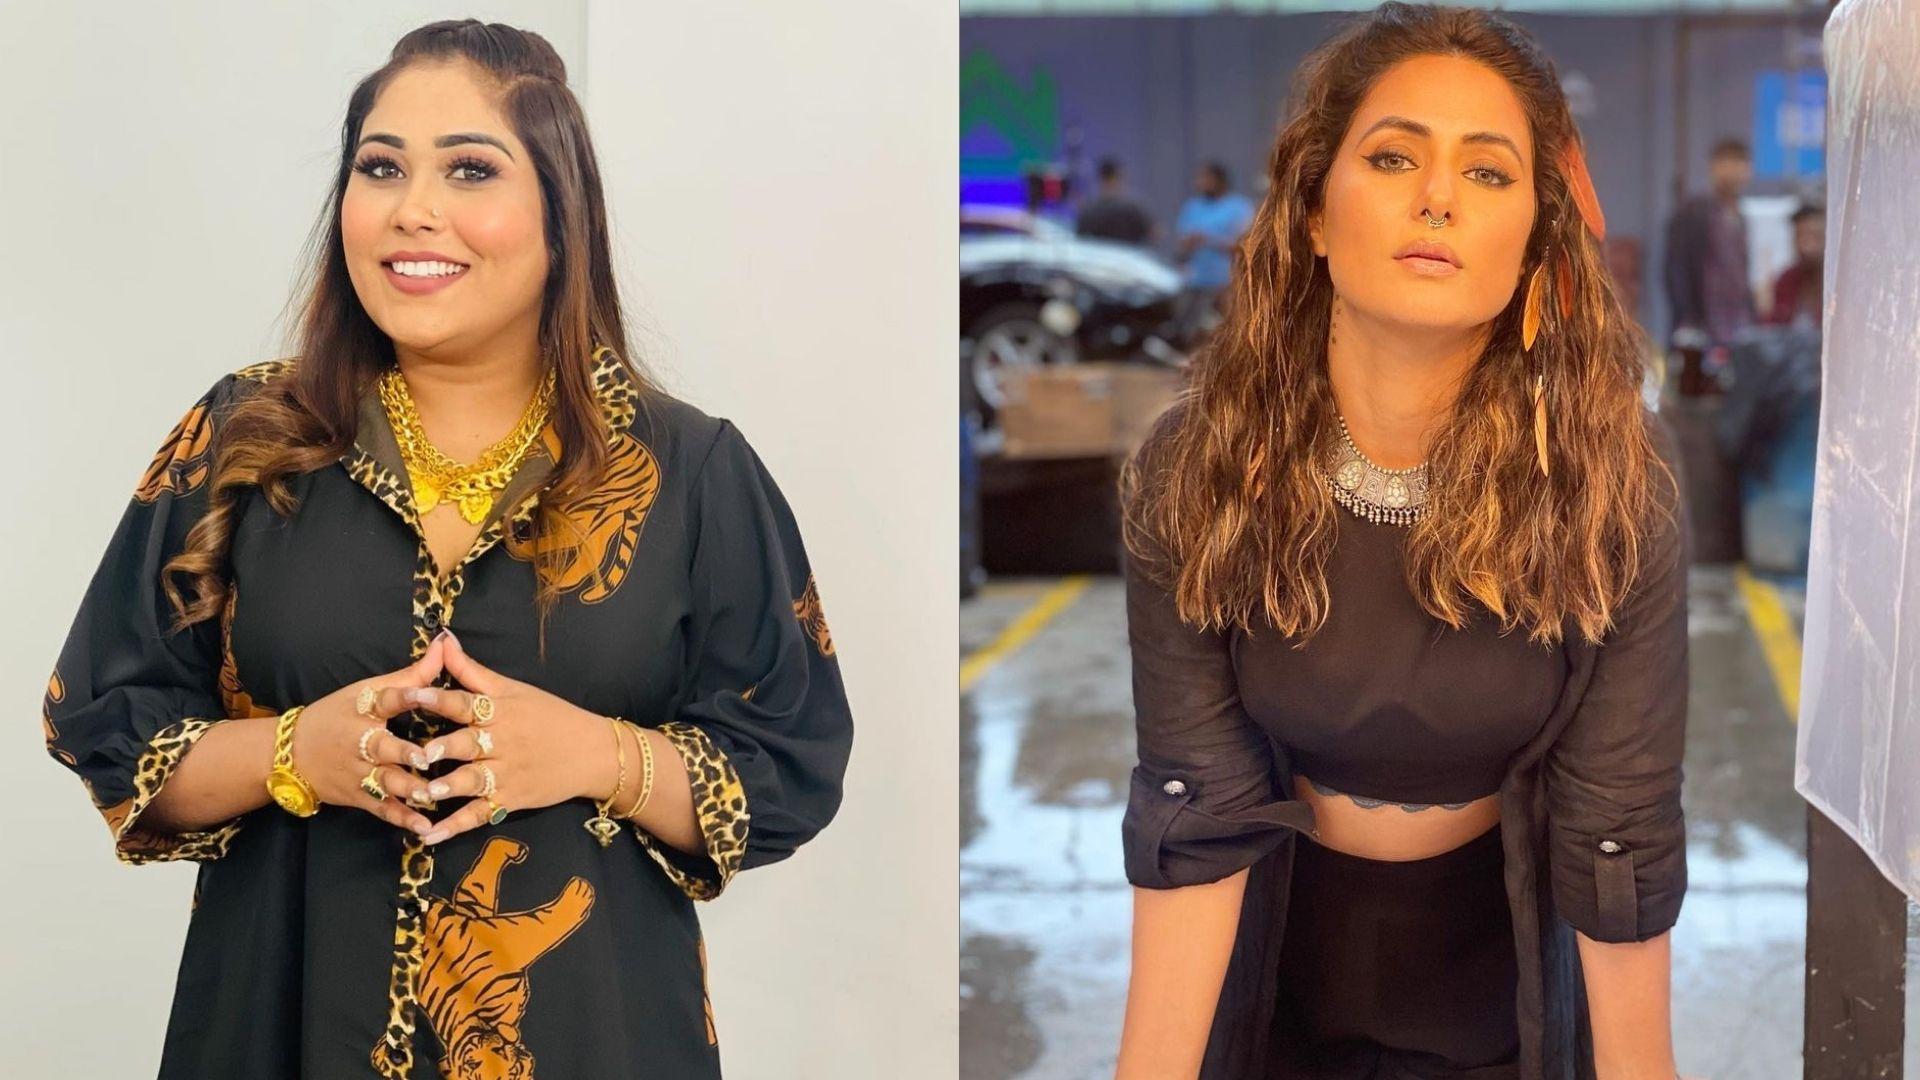 Bigg Boss 15 Weekend Ka Vaar: Days After Her Mental Wellness Post, Afsana Khan Greets Hina Khan With A Distasteful Comment – Know What